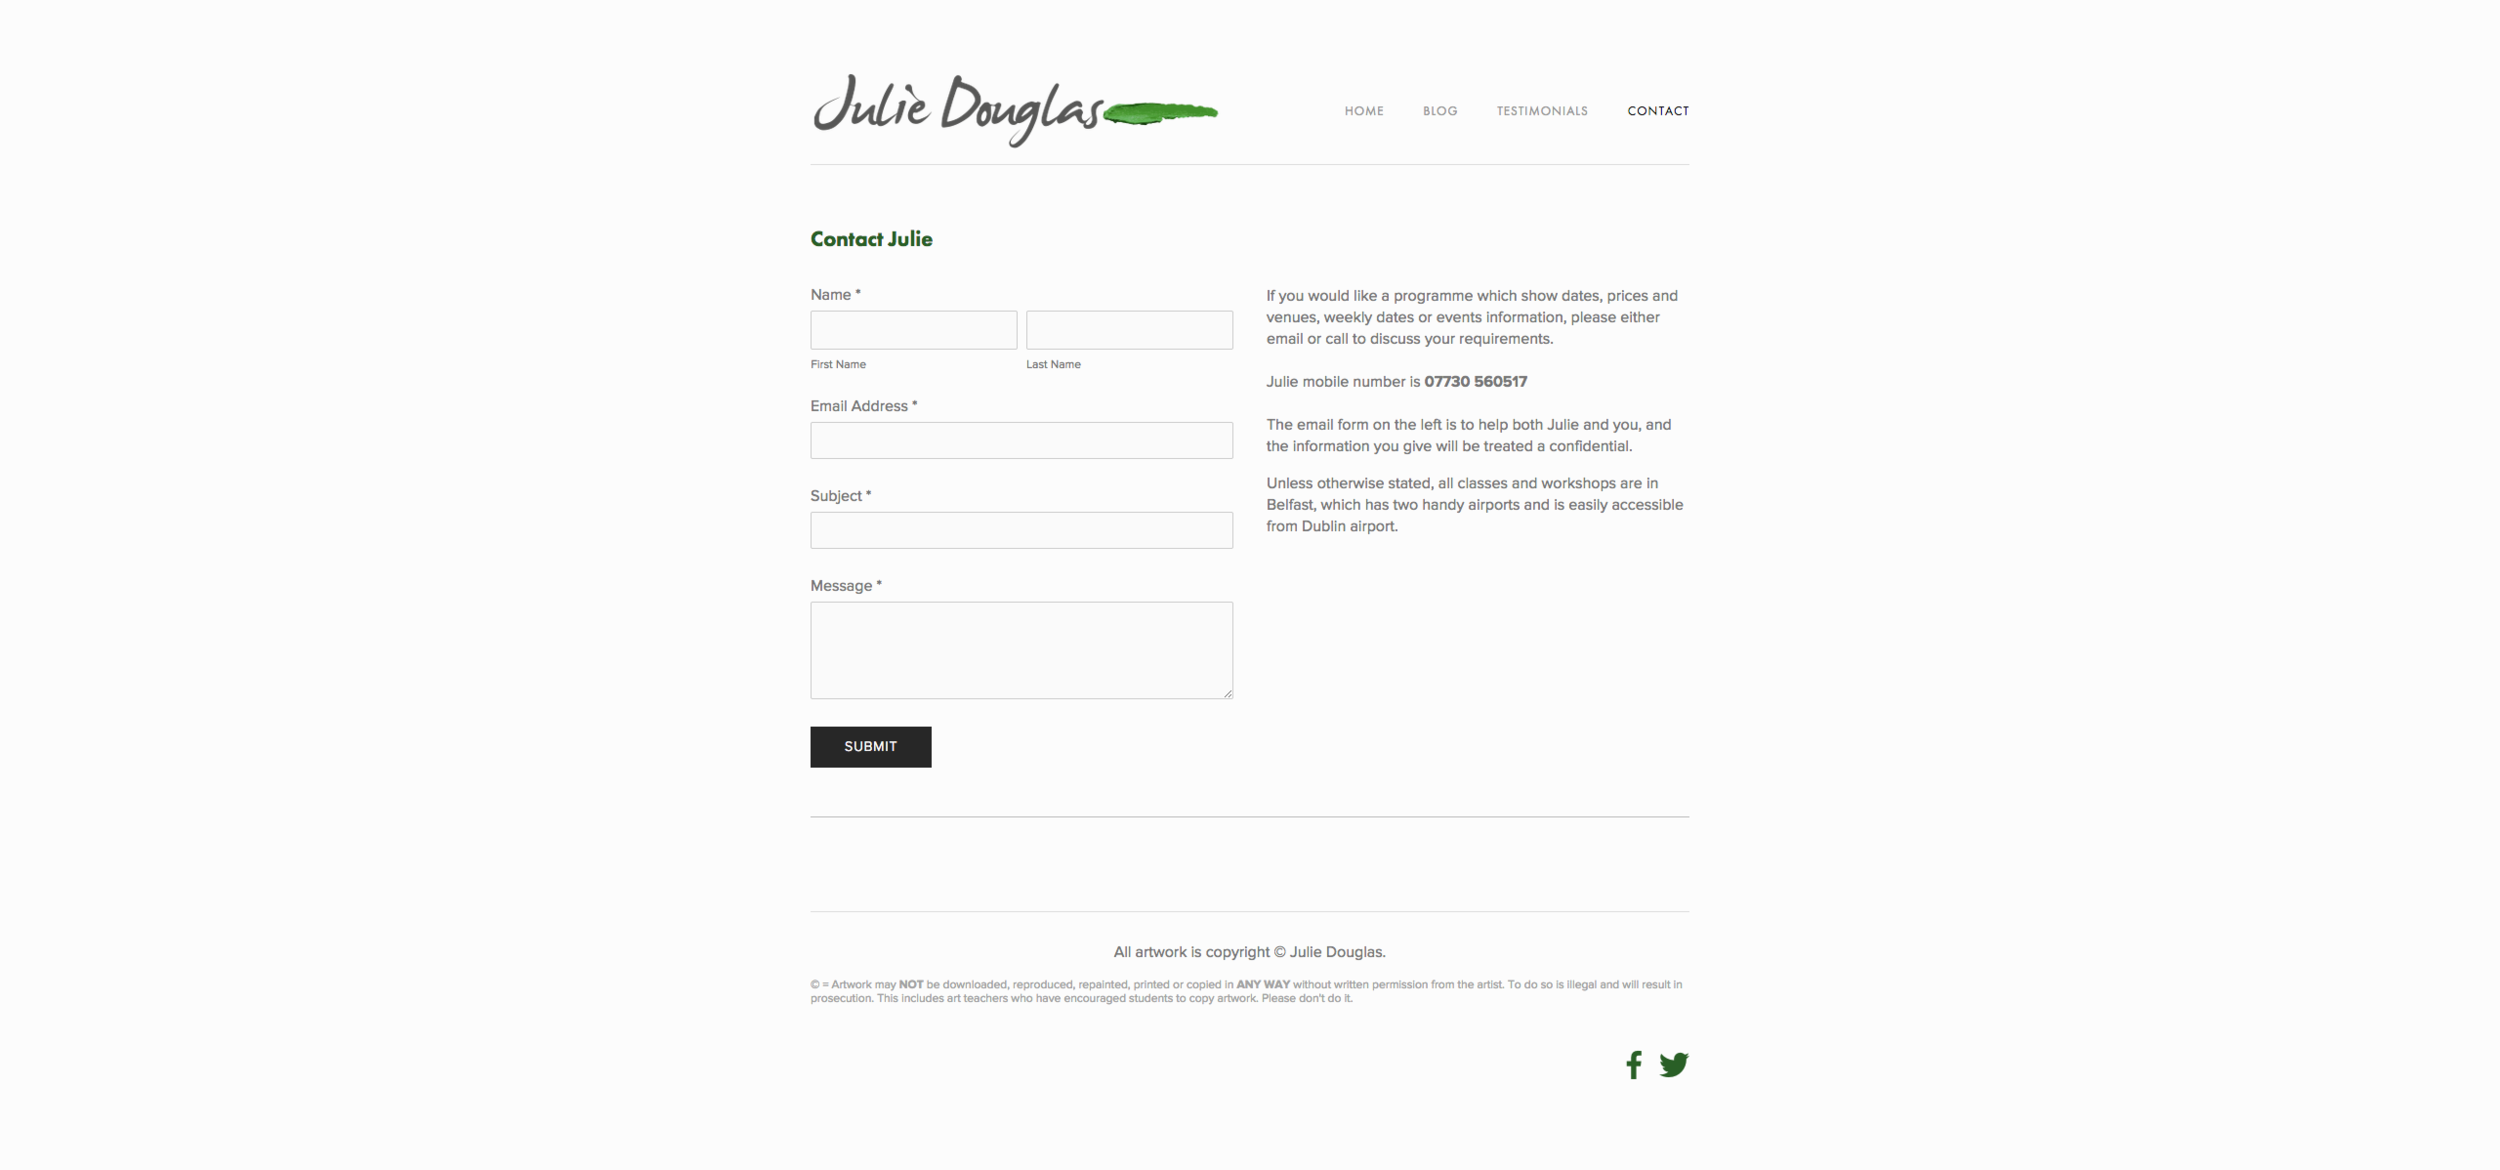 screencapture-www-juliedouglas-co-uk-contact-1429022130759.png